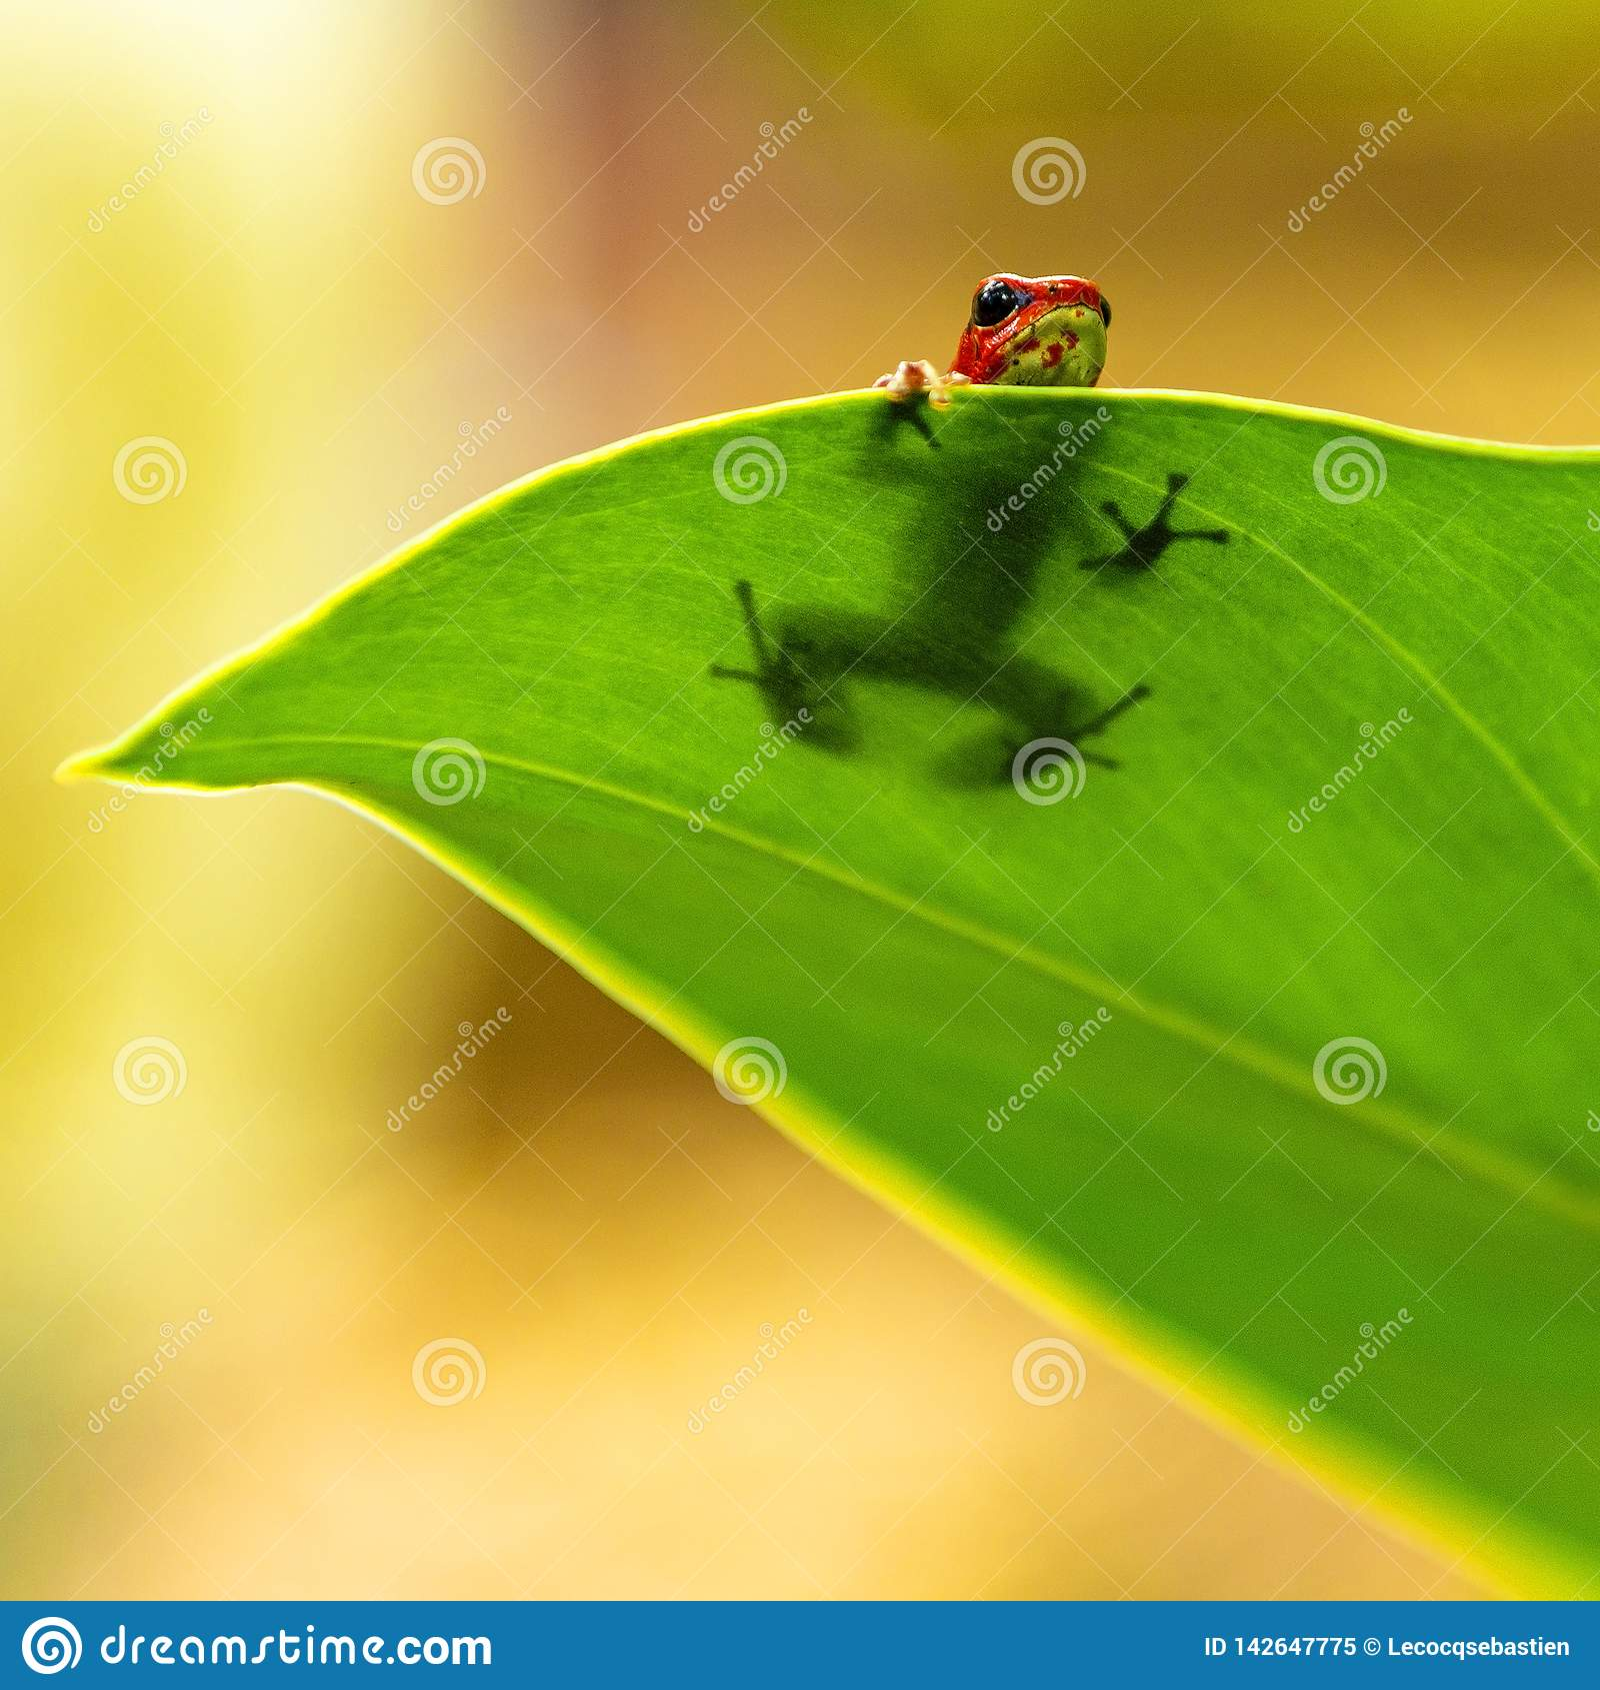 Strawberry Dart Frog in Hiding, Panama